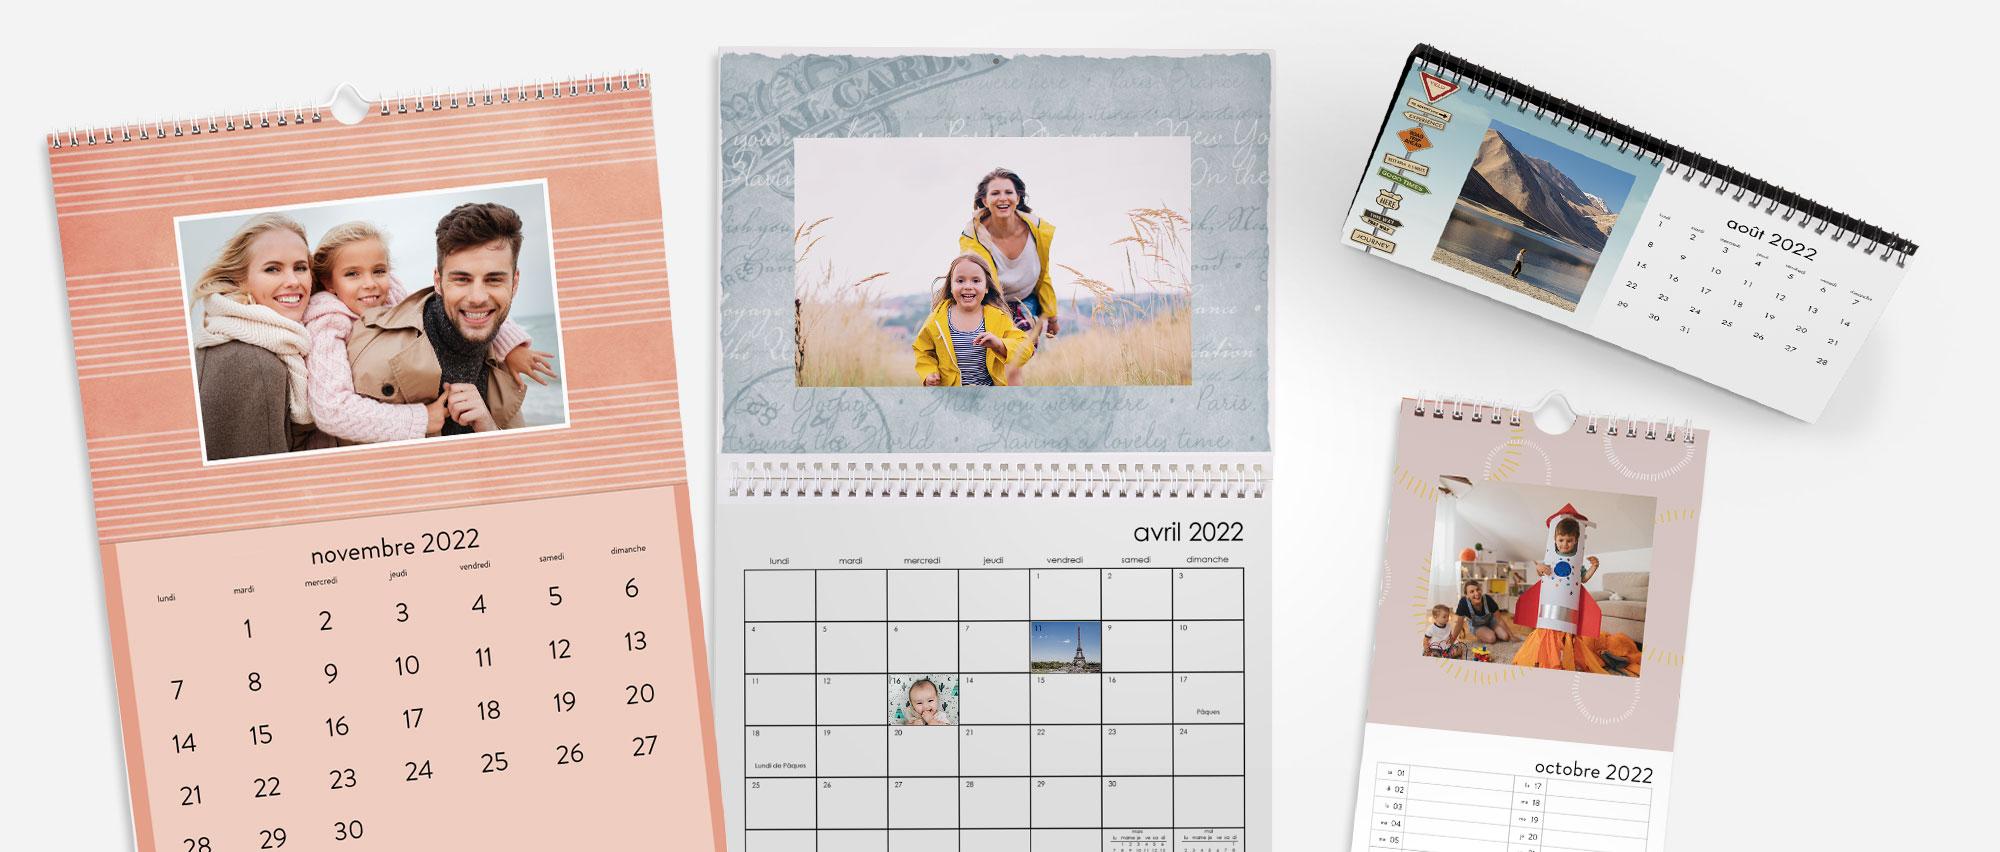 calendars-backgrounds